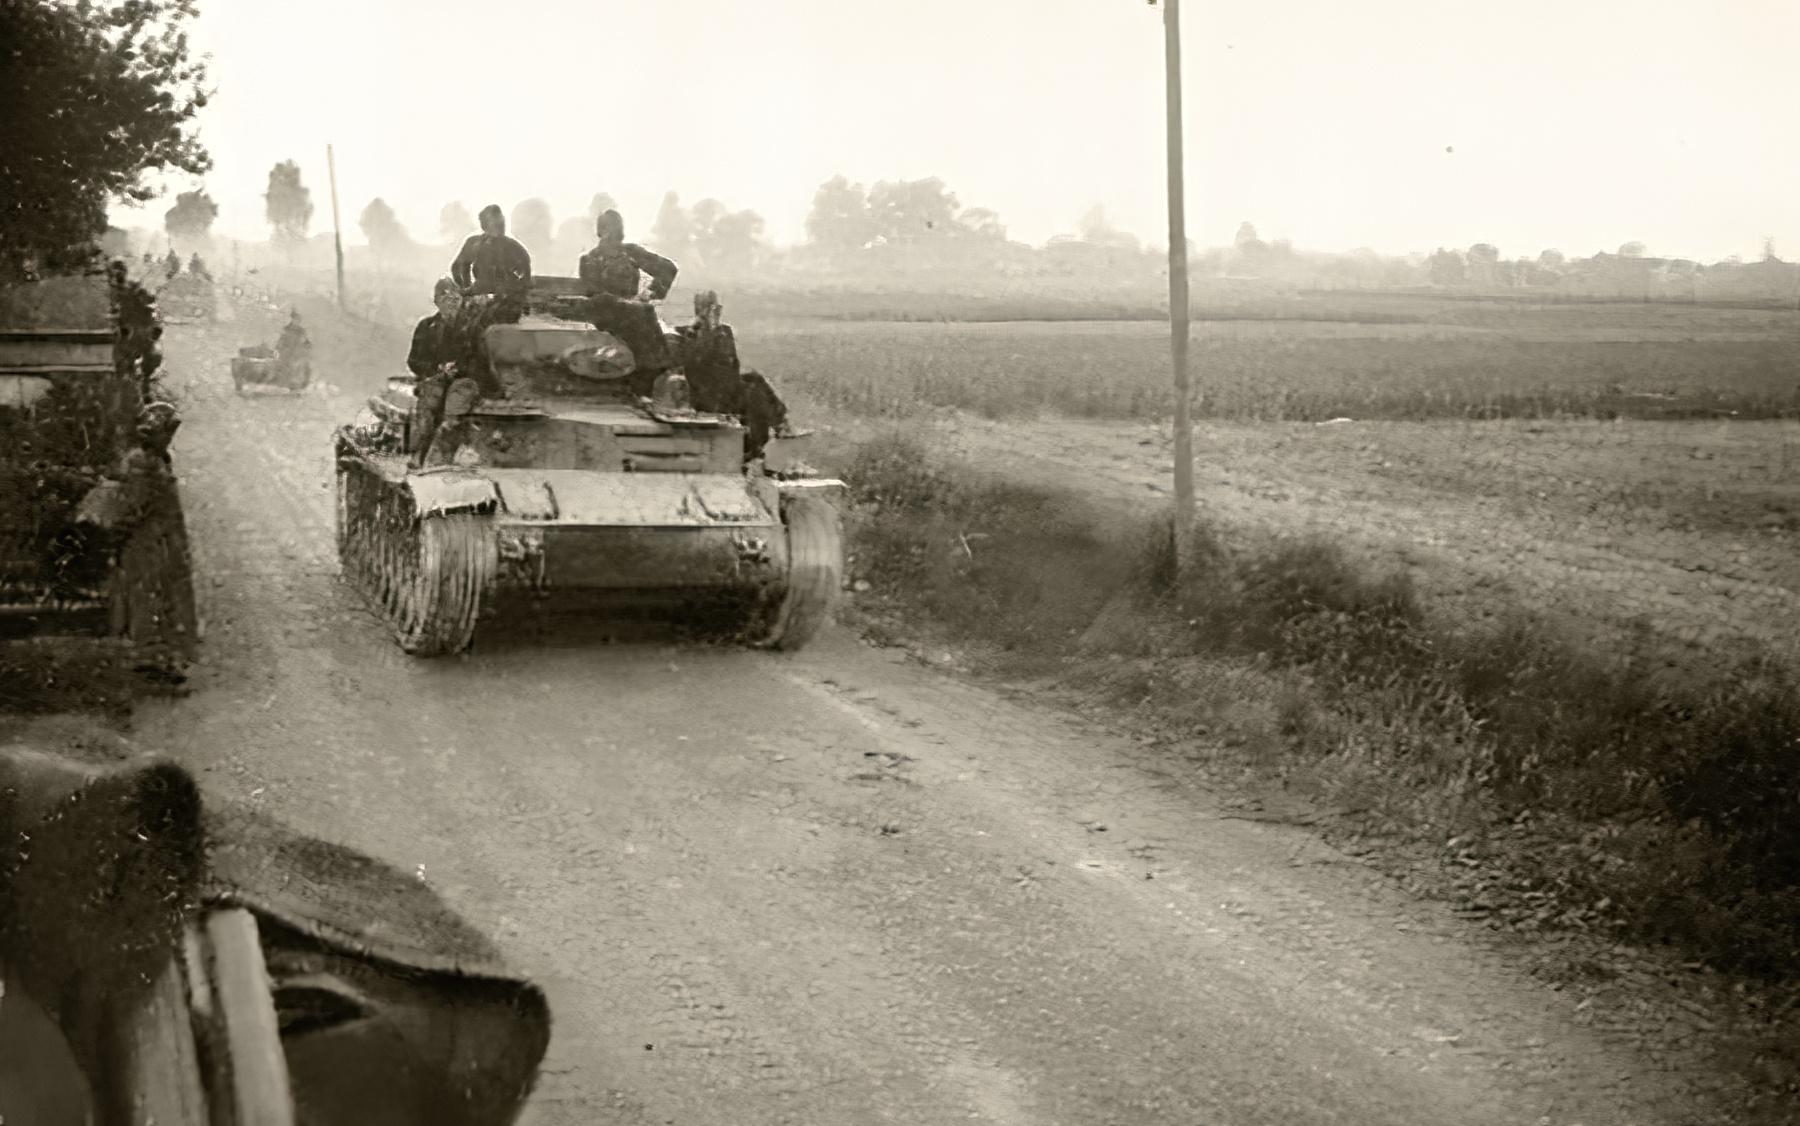 Wehrmacht tank column advance towards Saint Nazaire France 1940 ebay 01